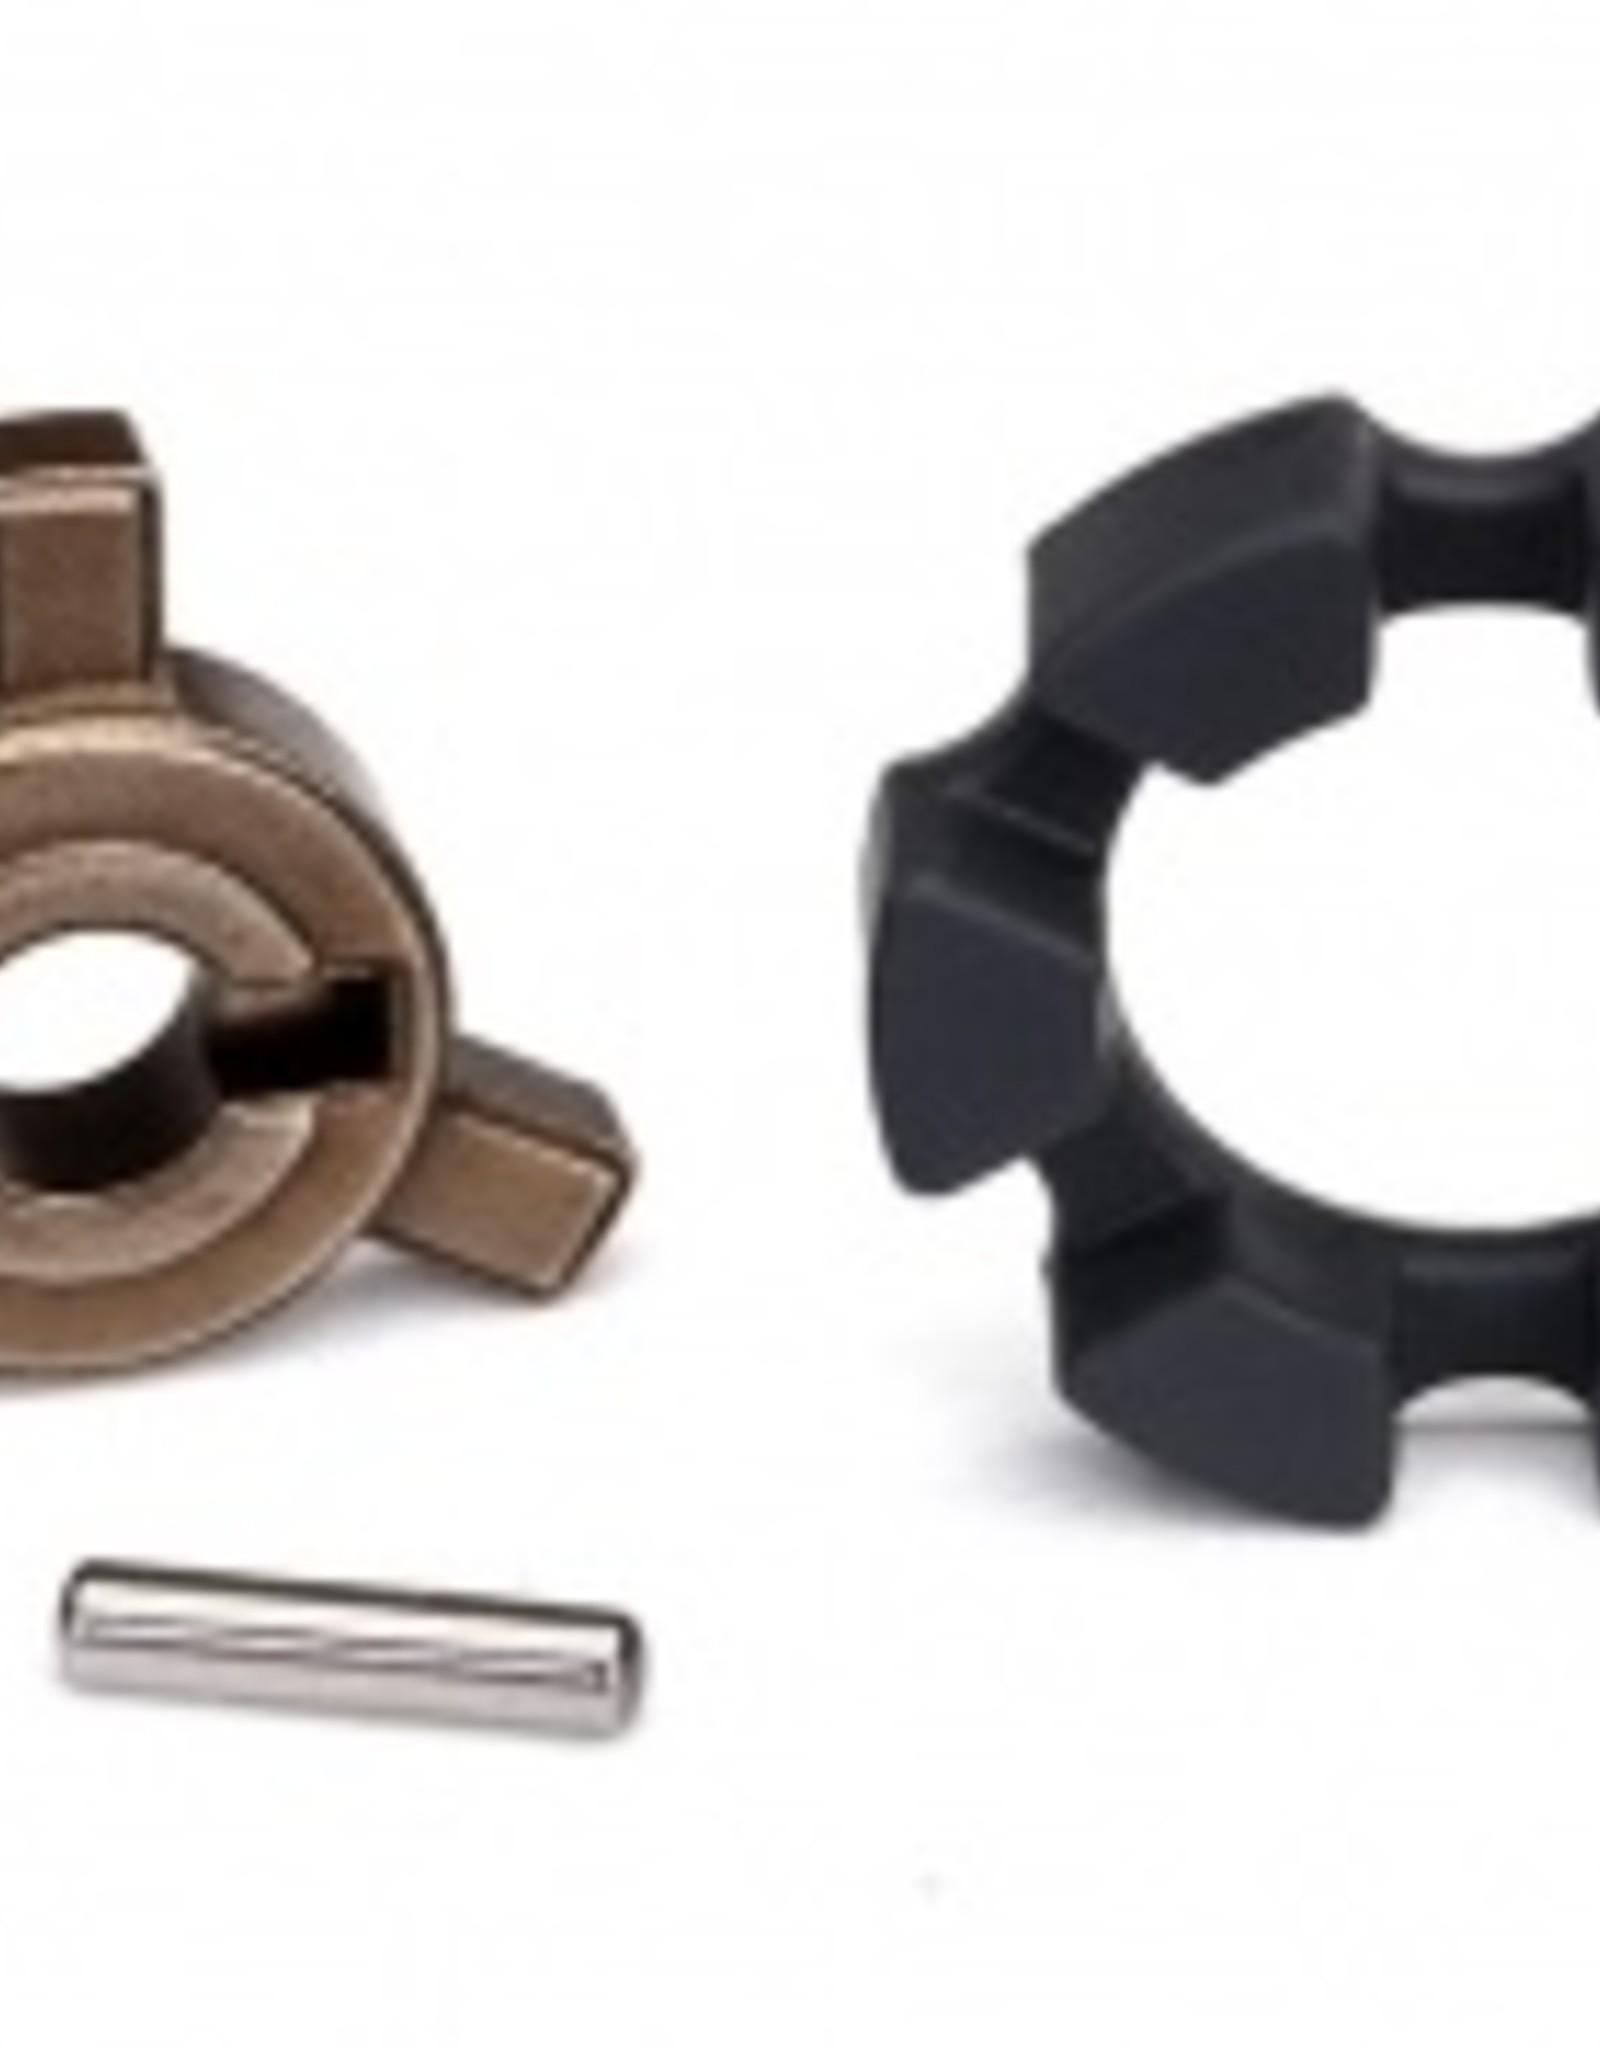 Traxxas Traxxas X-Maxx Cush drive key/ pin/ elastomer damper